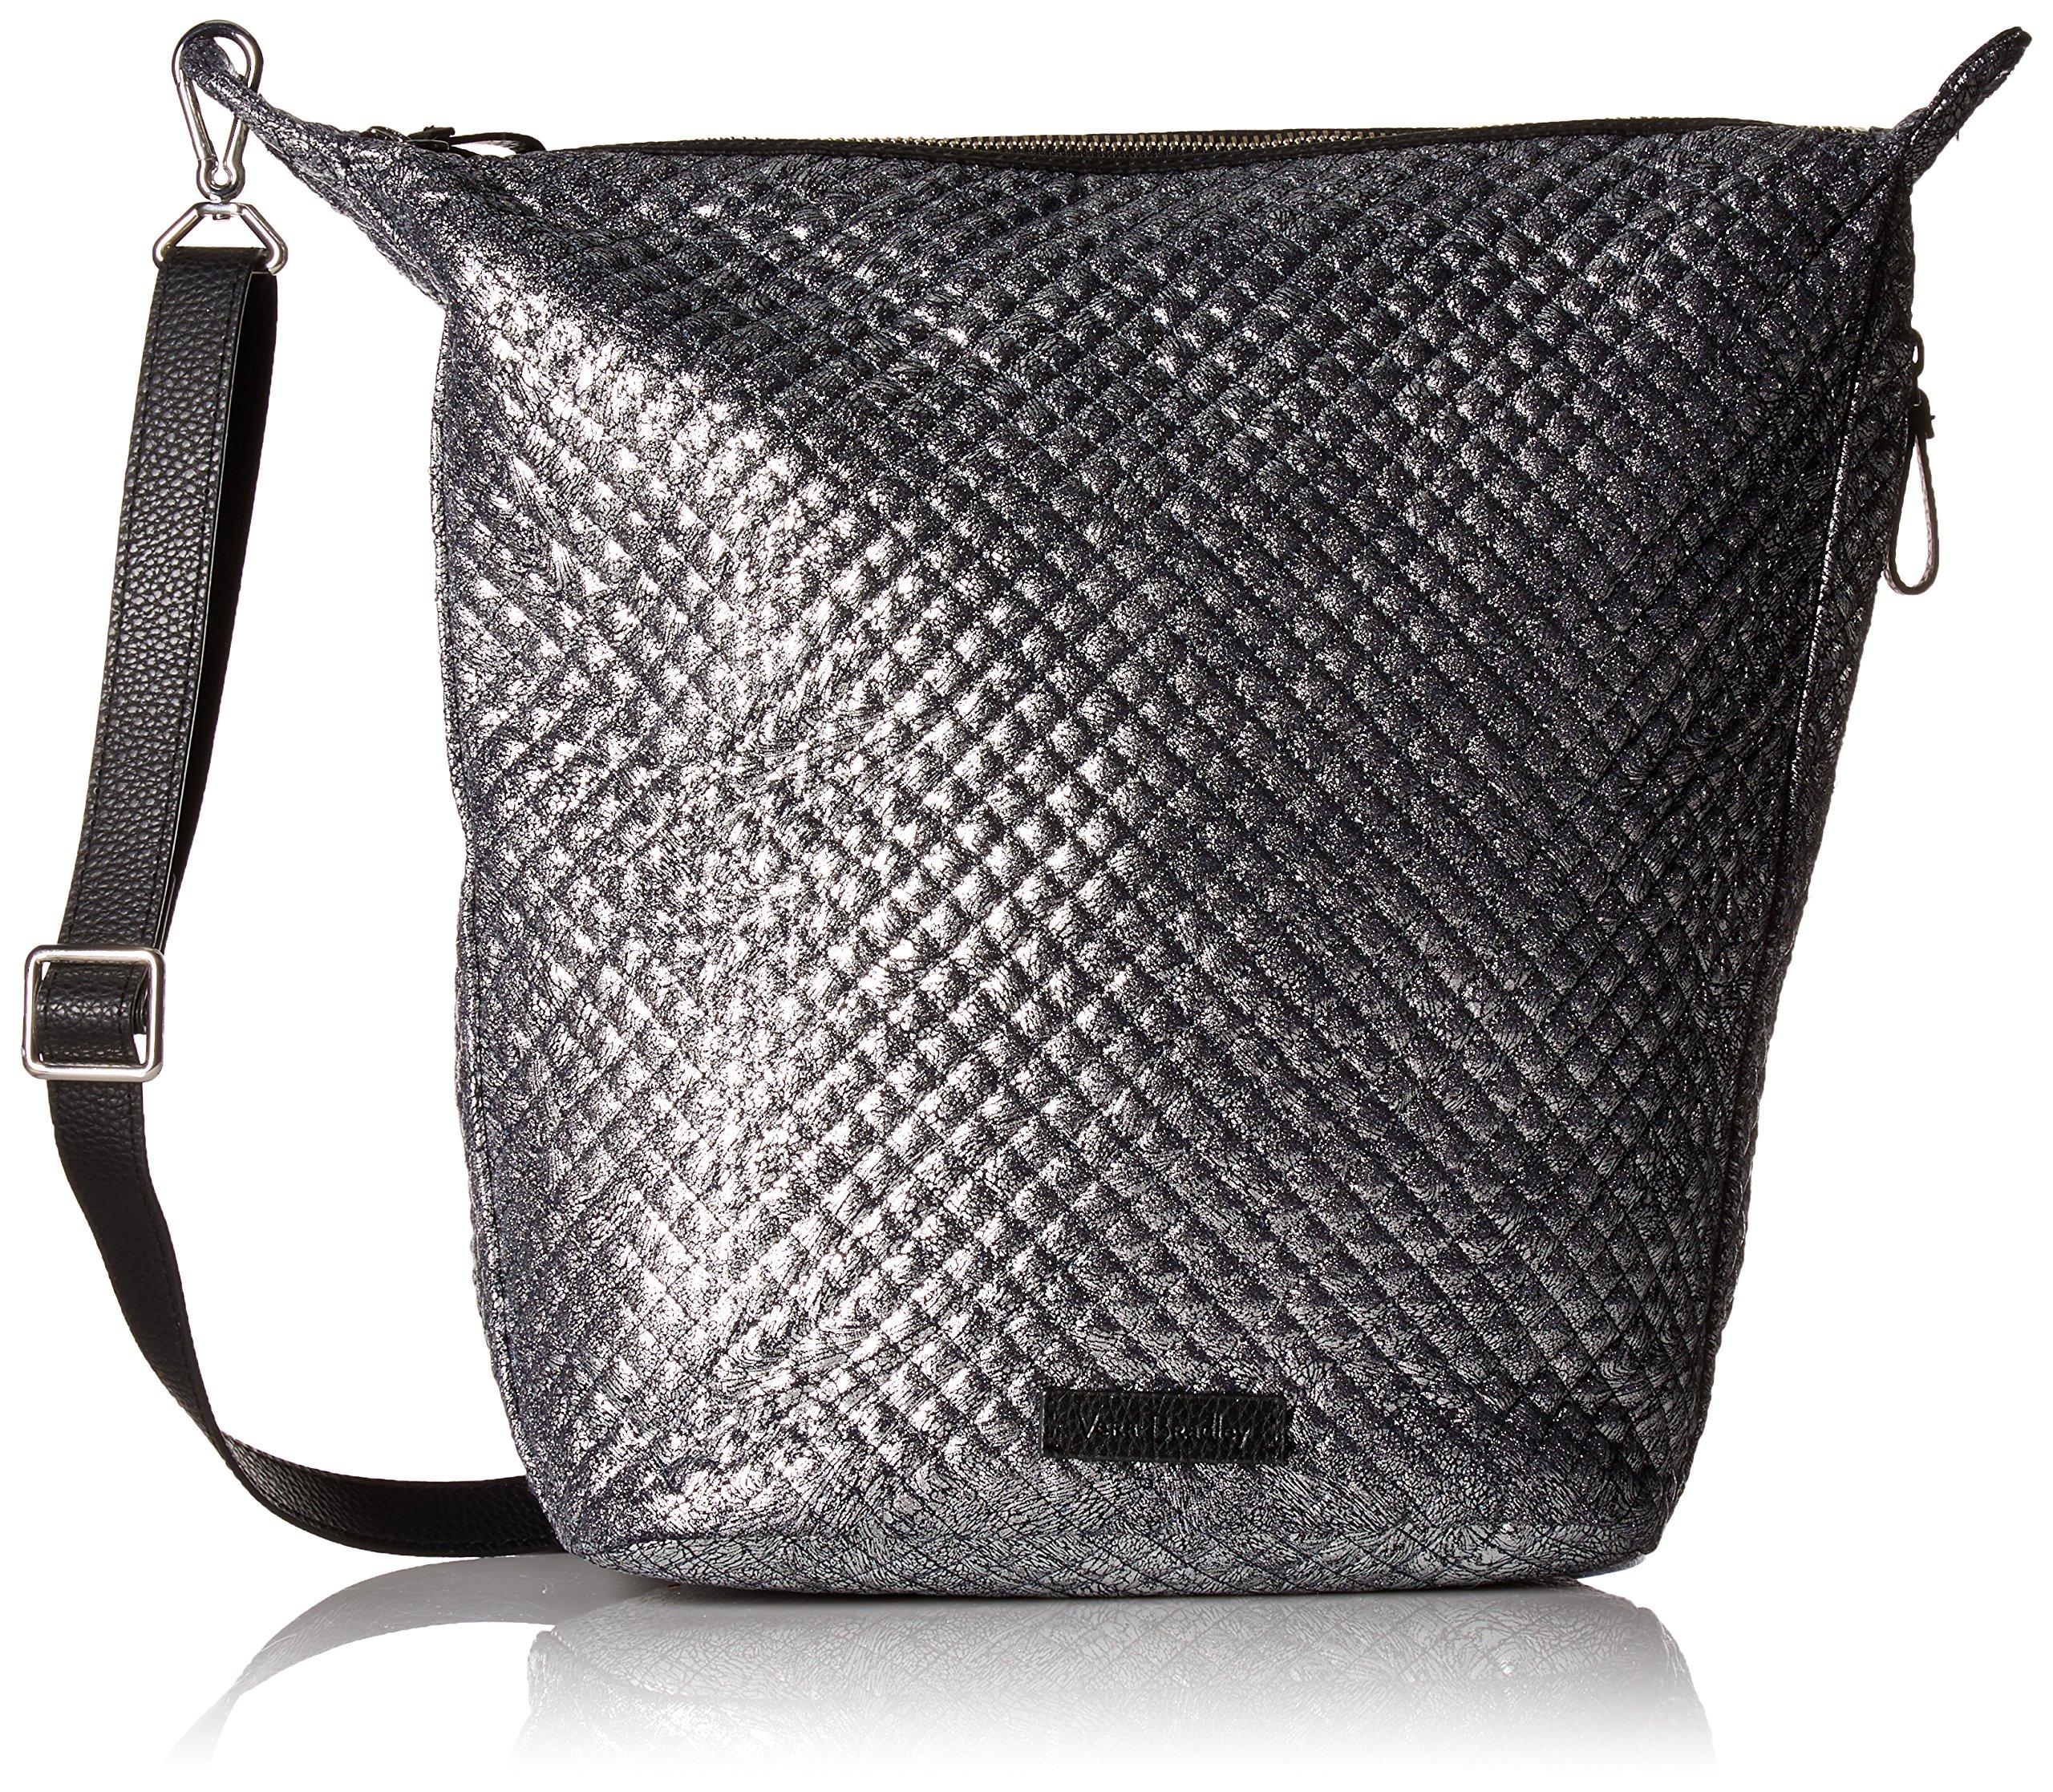 Vera Bradley Halo Carson Hobo Bag-Metallic Microfiber, Mist